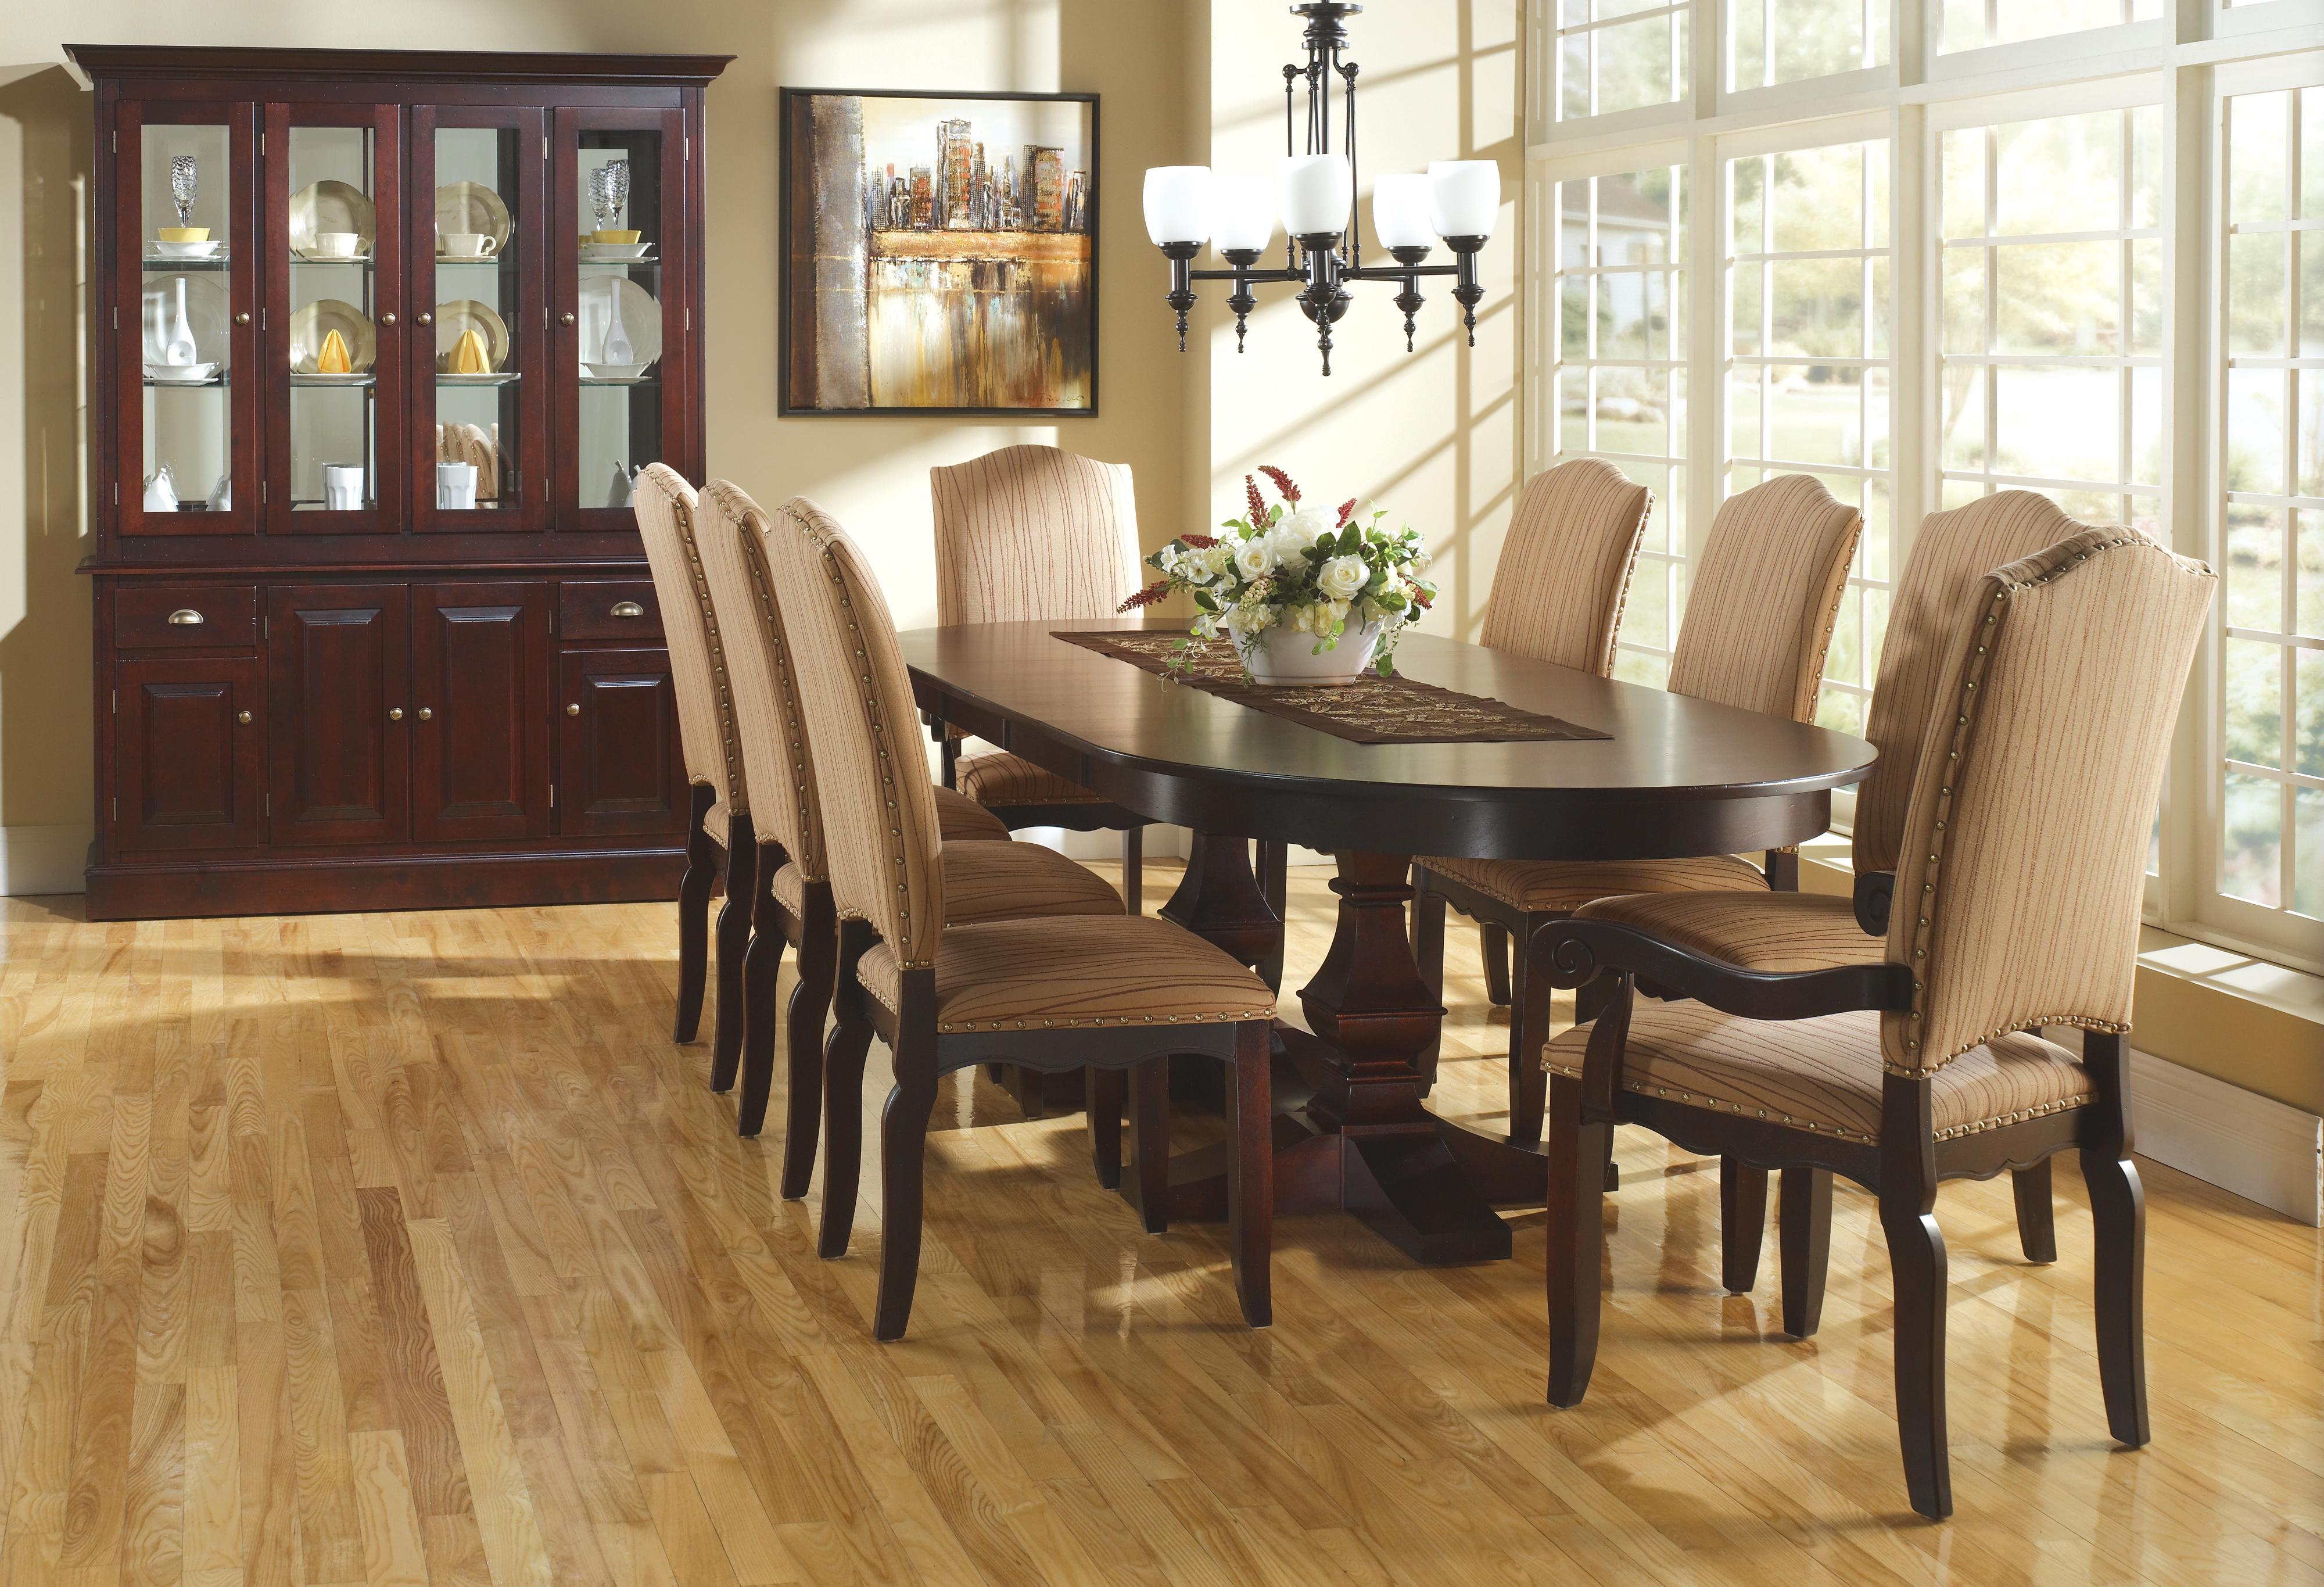 Canadel Custom Dining Customizable 60 Inch Hutch & Buffet